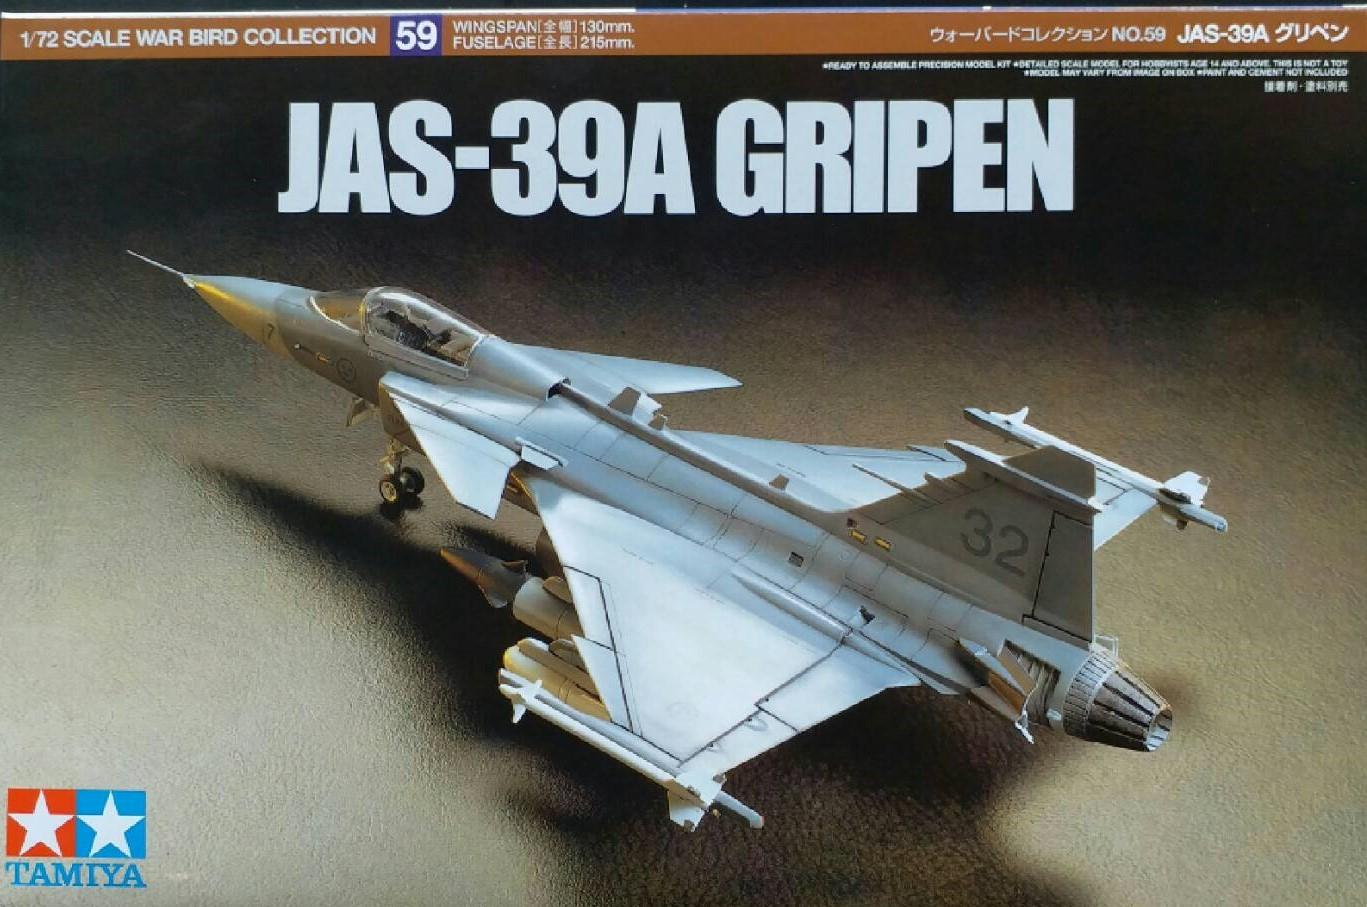 TA60759 JAS-39A Gripen 1/72 (บ.ข.20 ของ ทอ.ไทย)